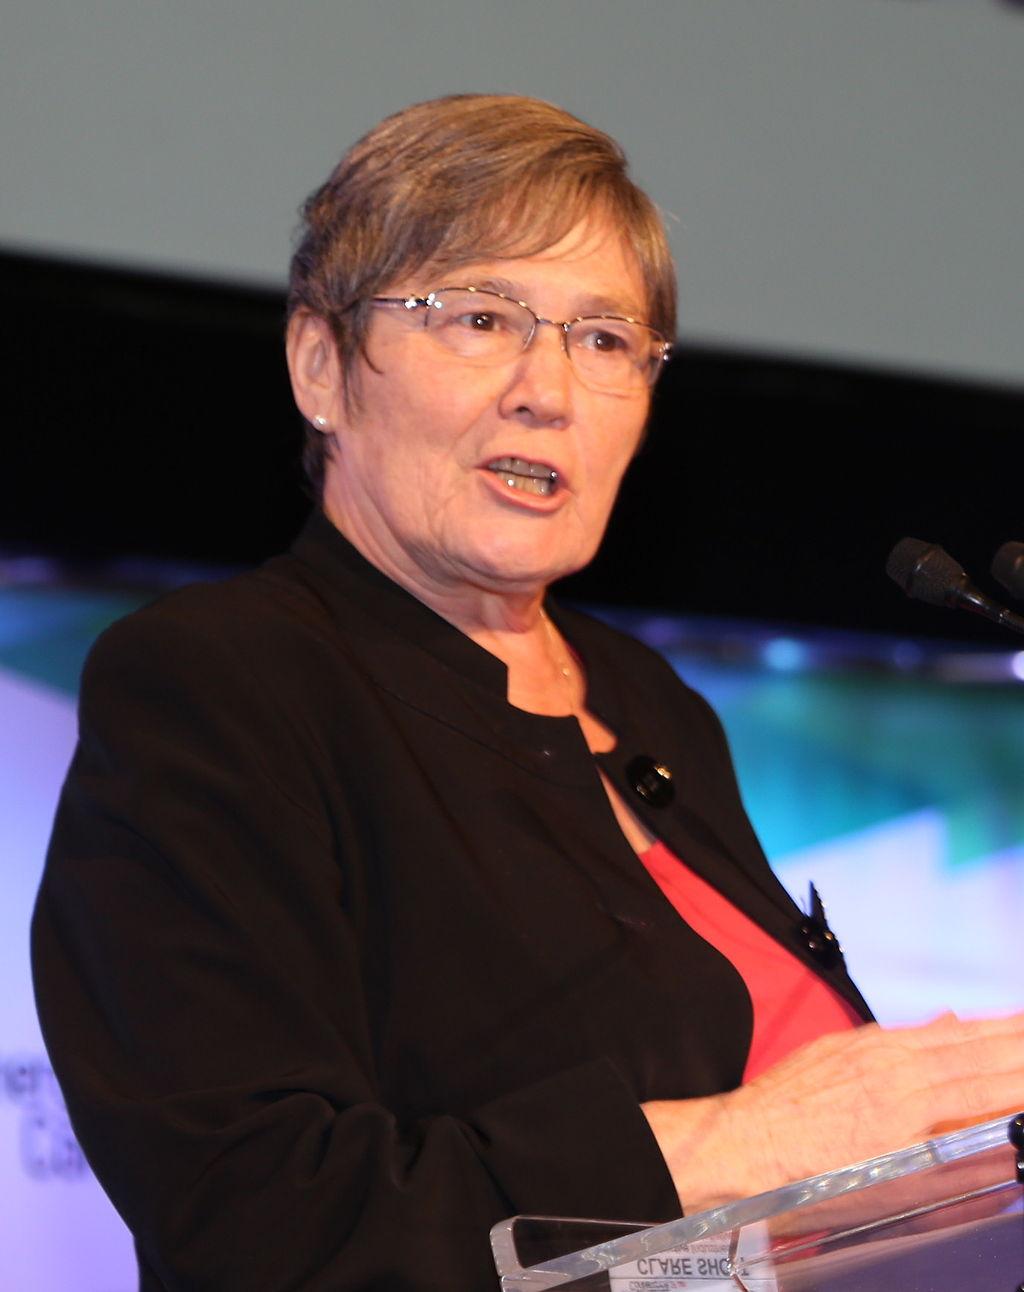 Clare Short, ex-Labour MP